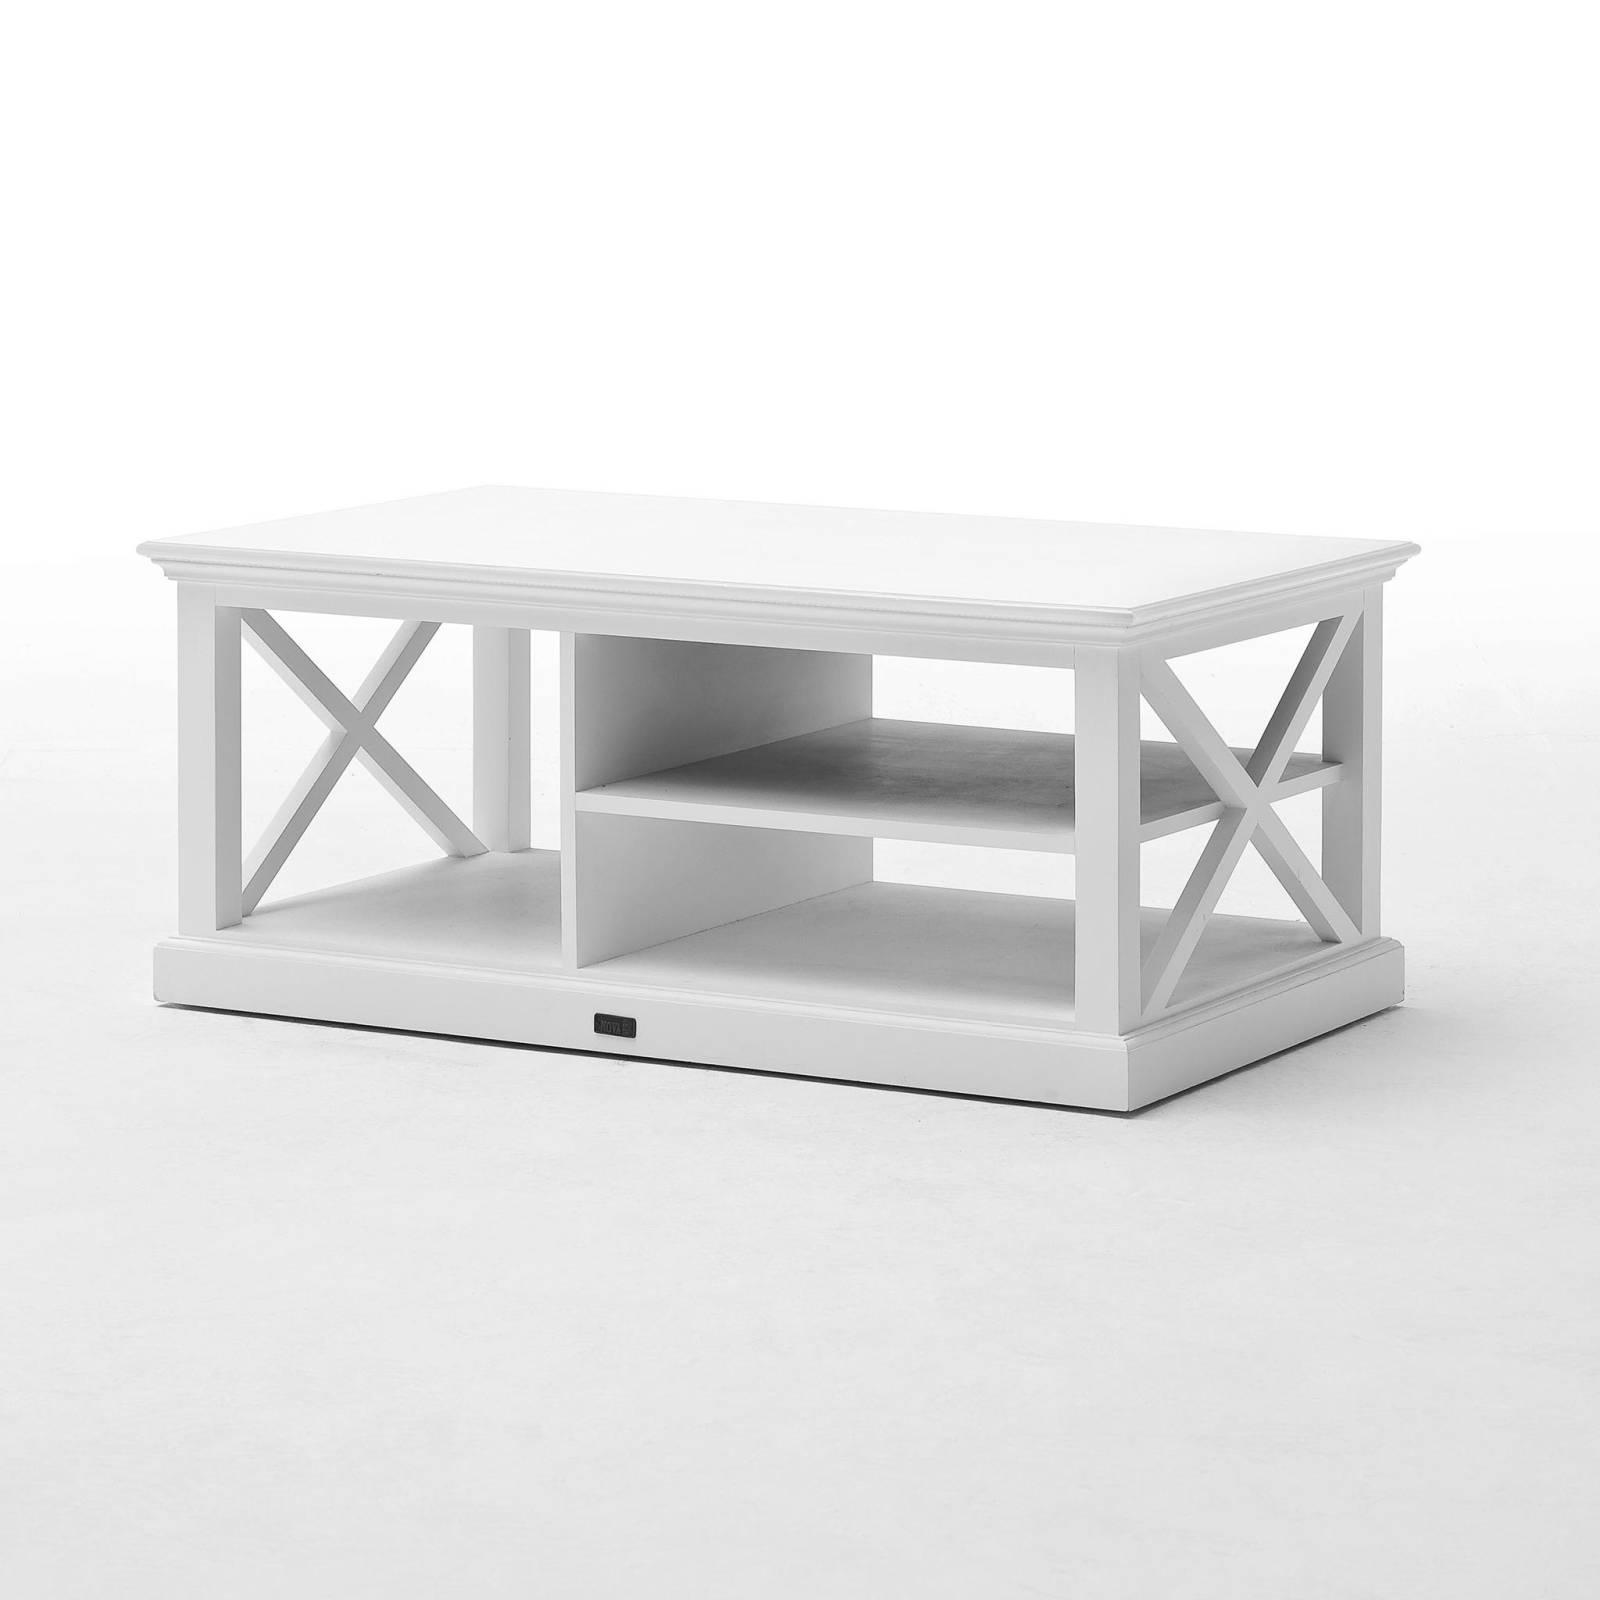 Table Basse Torini Acajou - meuble bois massif